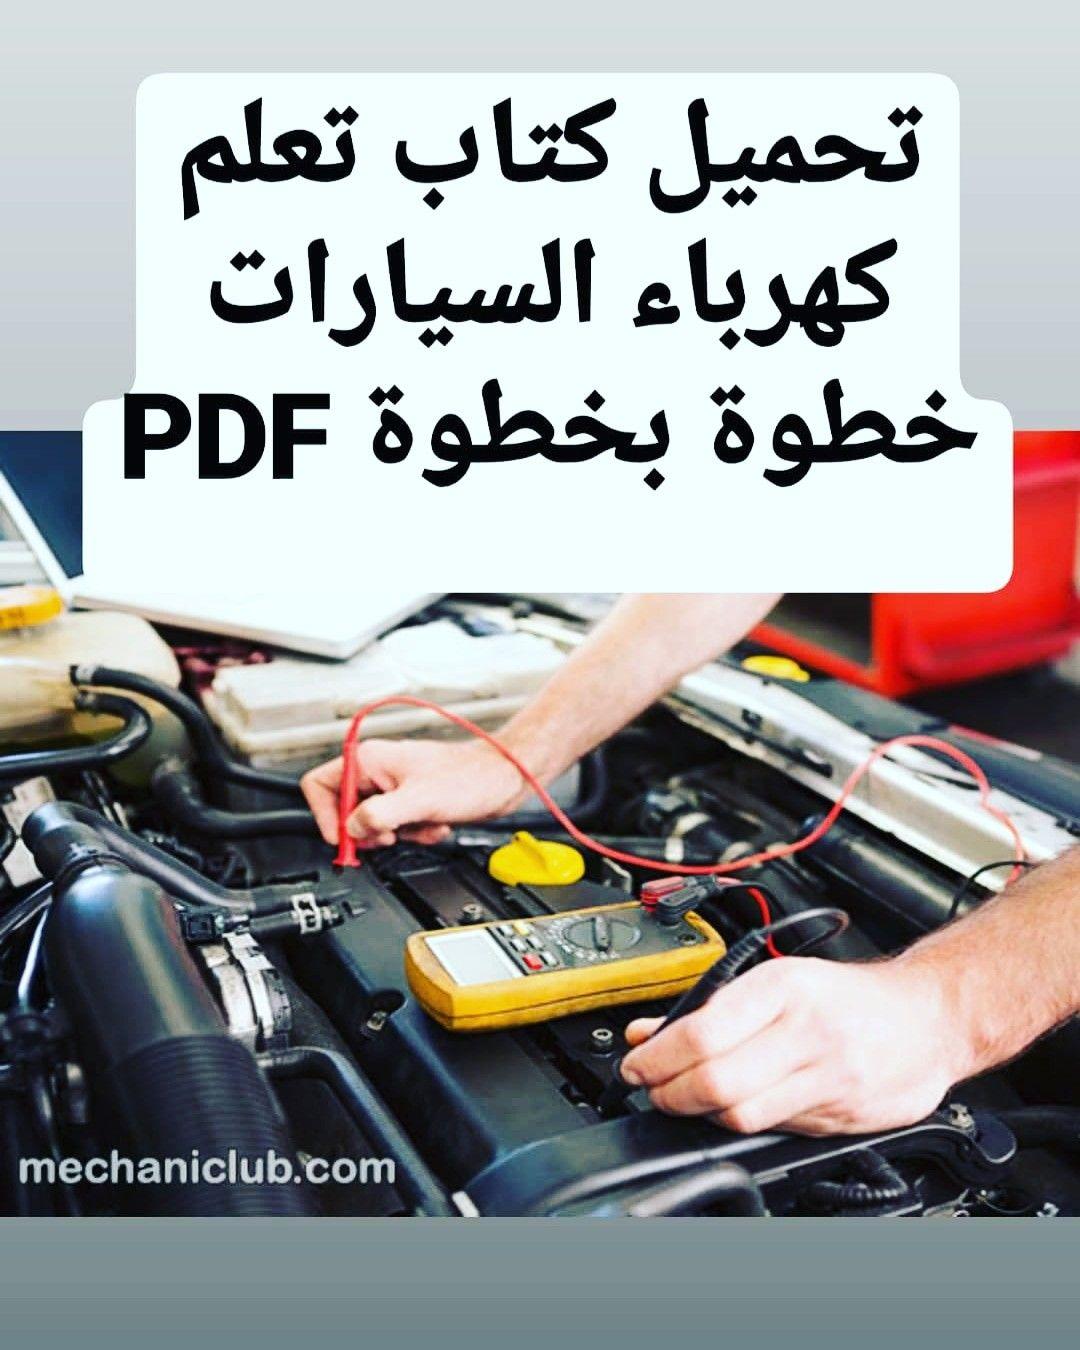 تحميل كتاب تعلم كهرباء السيارات خطوة بخطوة Pdf Pdf Books Reading Automotive Repair Chevrolet S 10